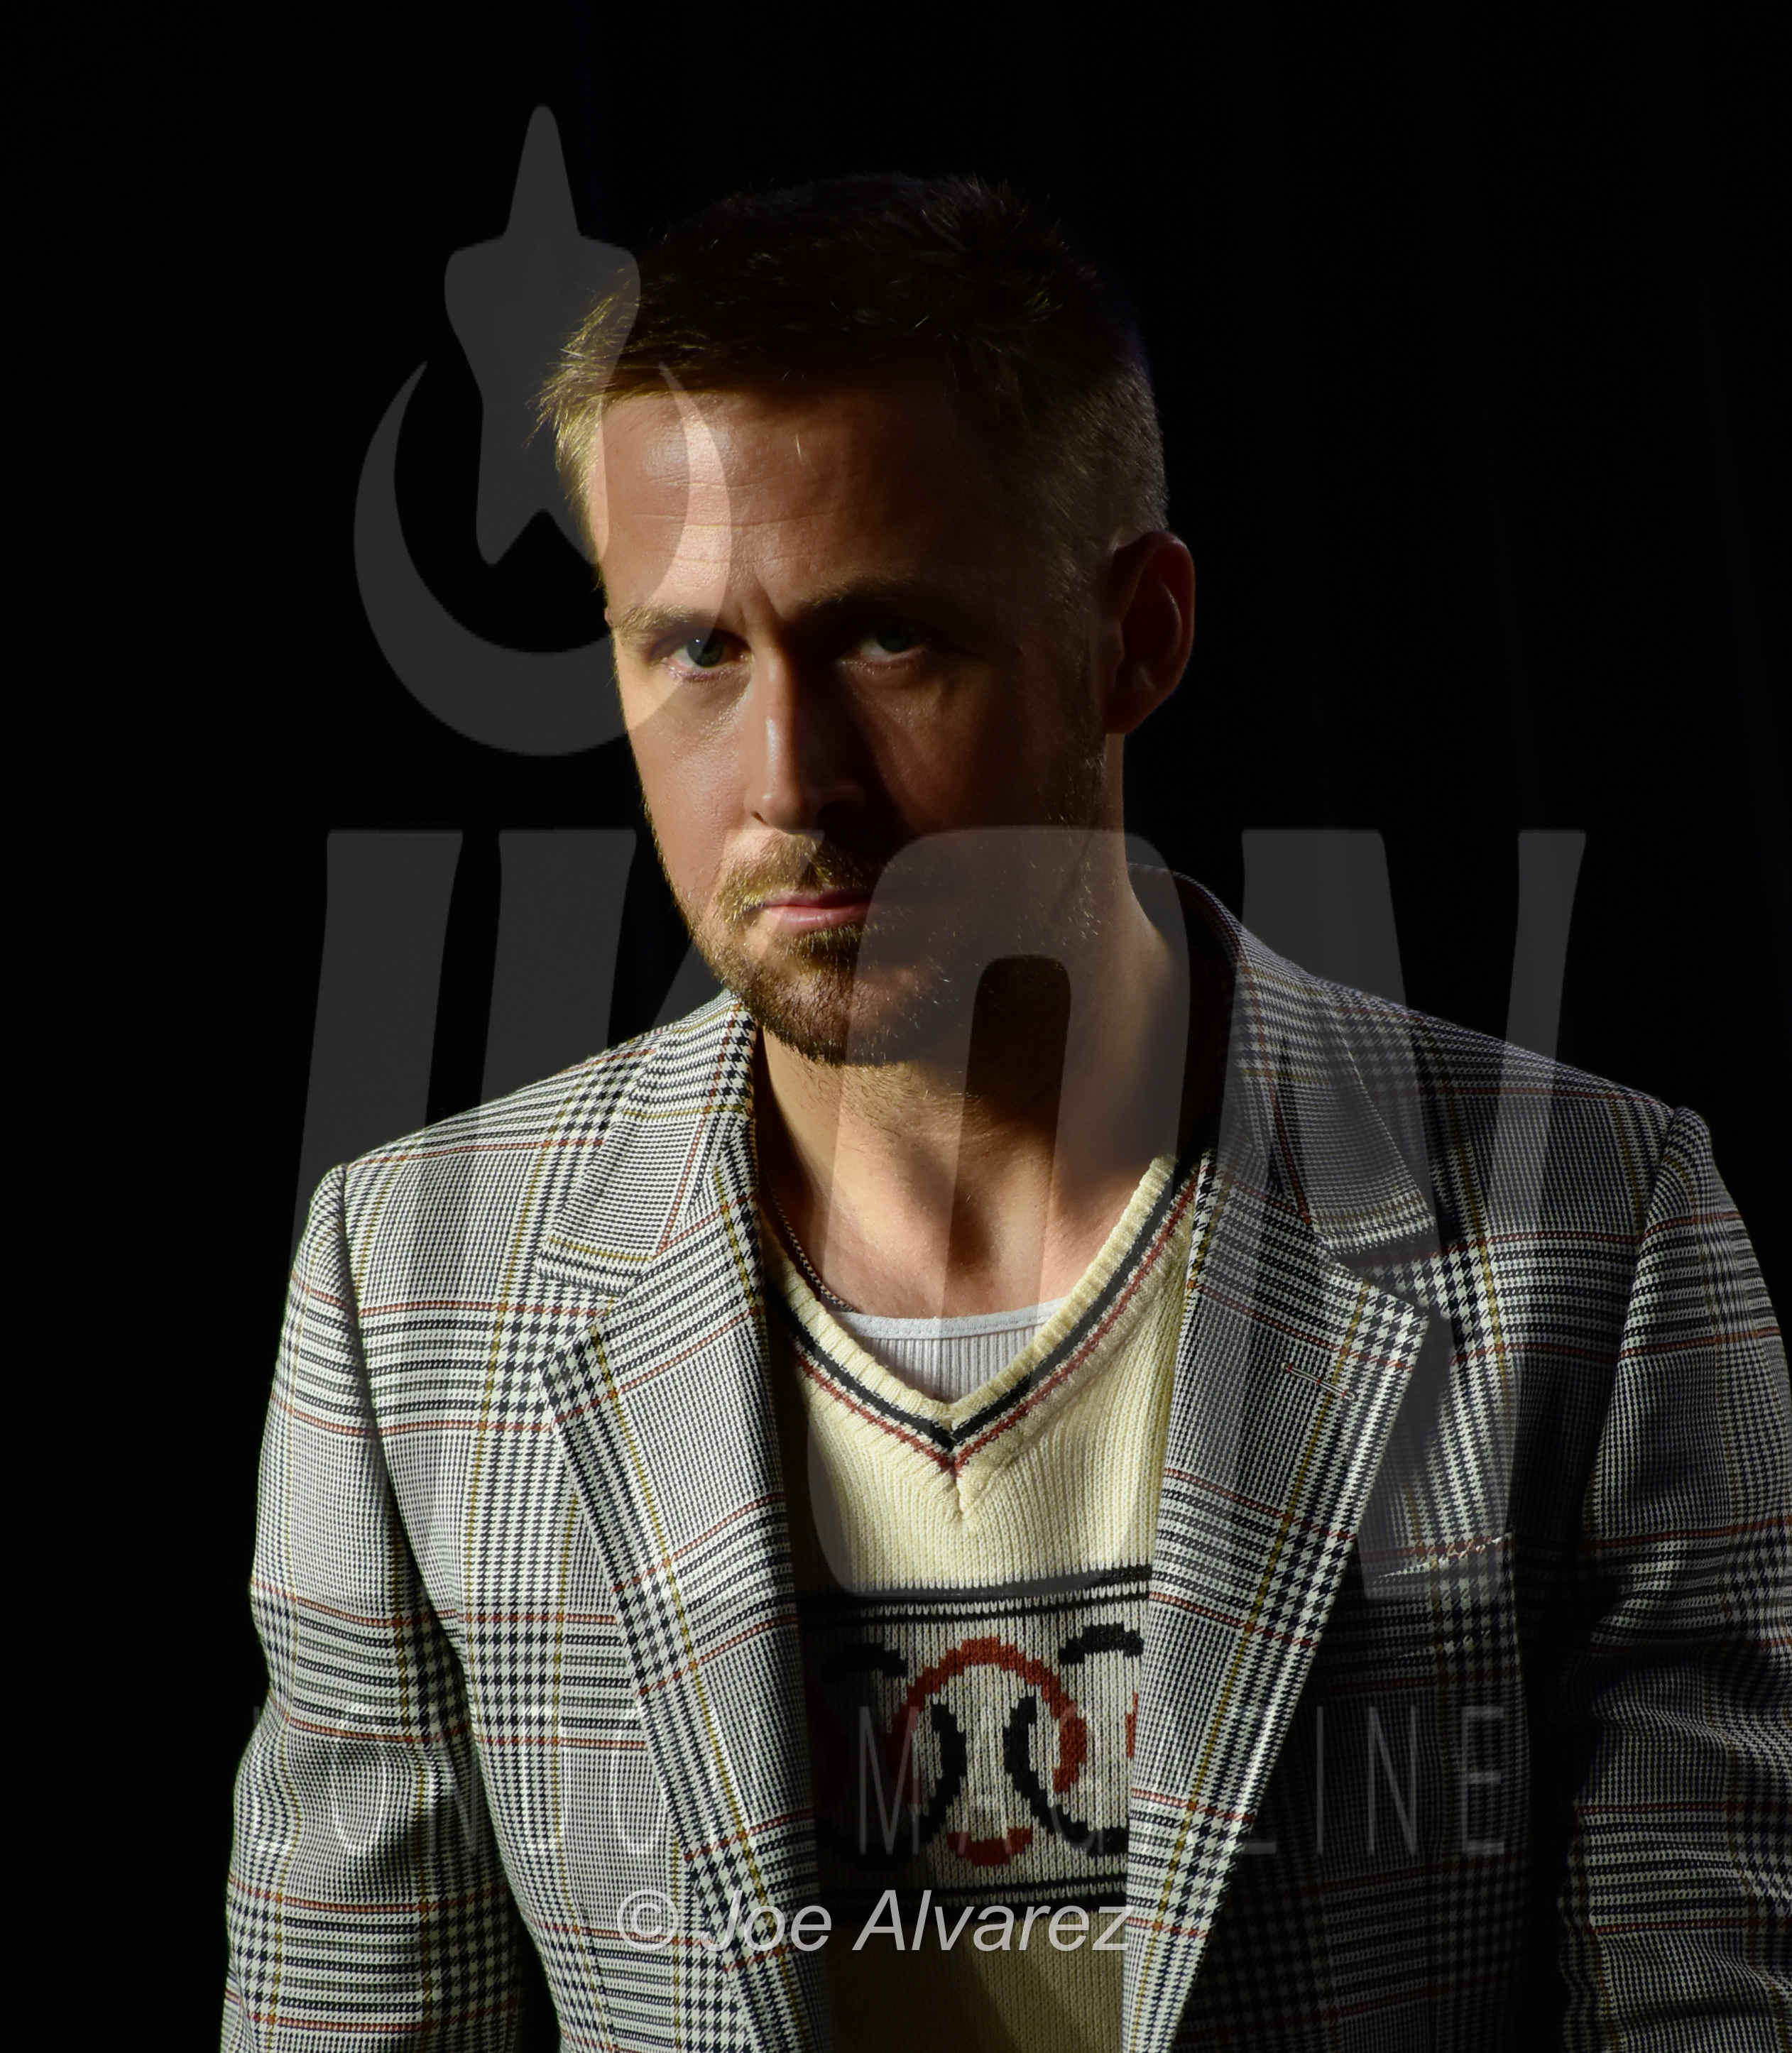 Ryan Gosling First Man press conference Toronto Film Festival TIFF © JOE ALVAREZ